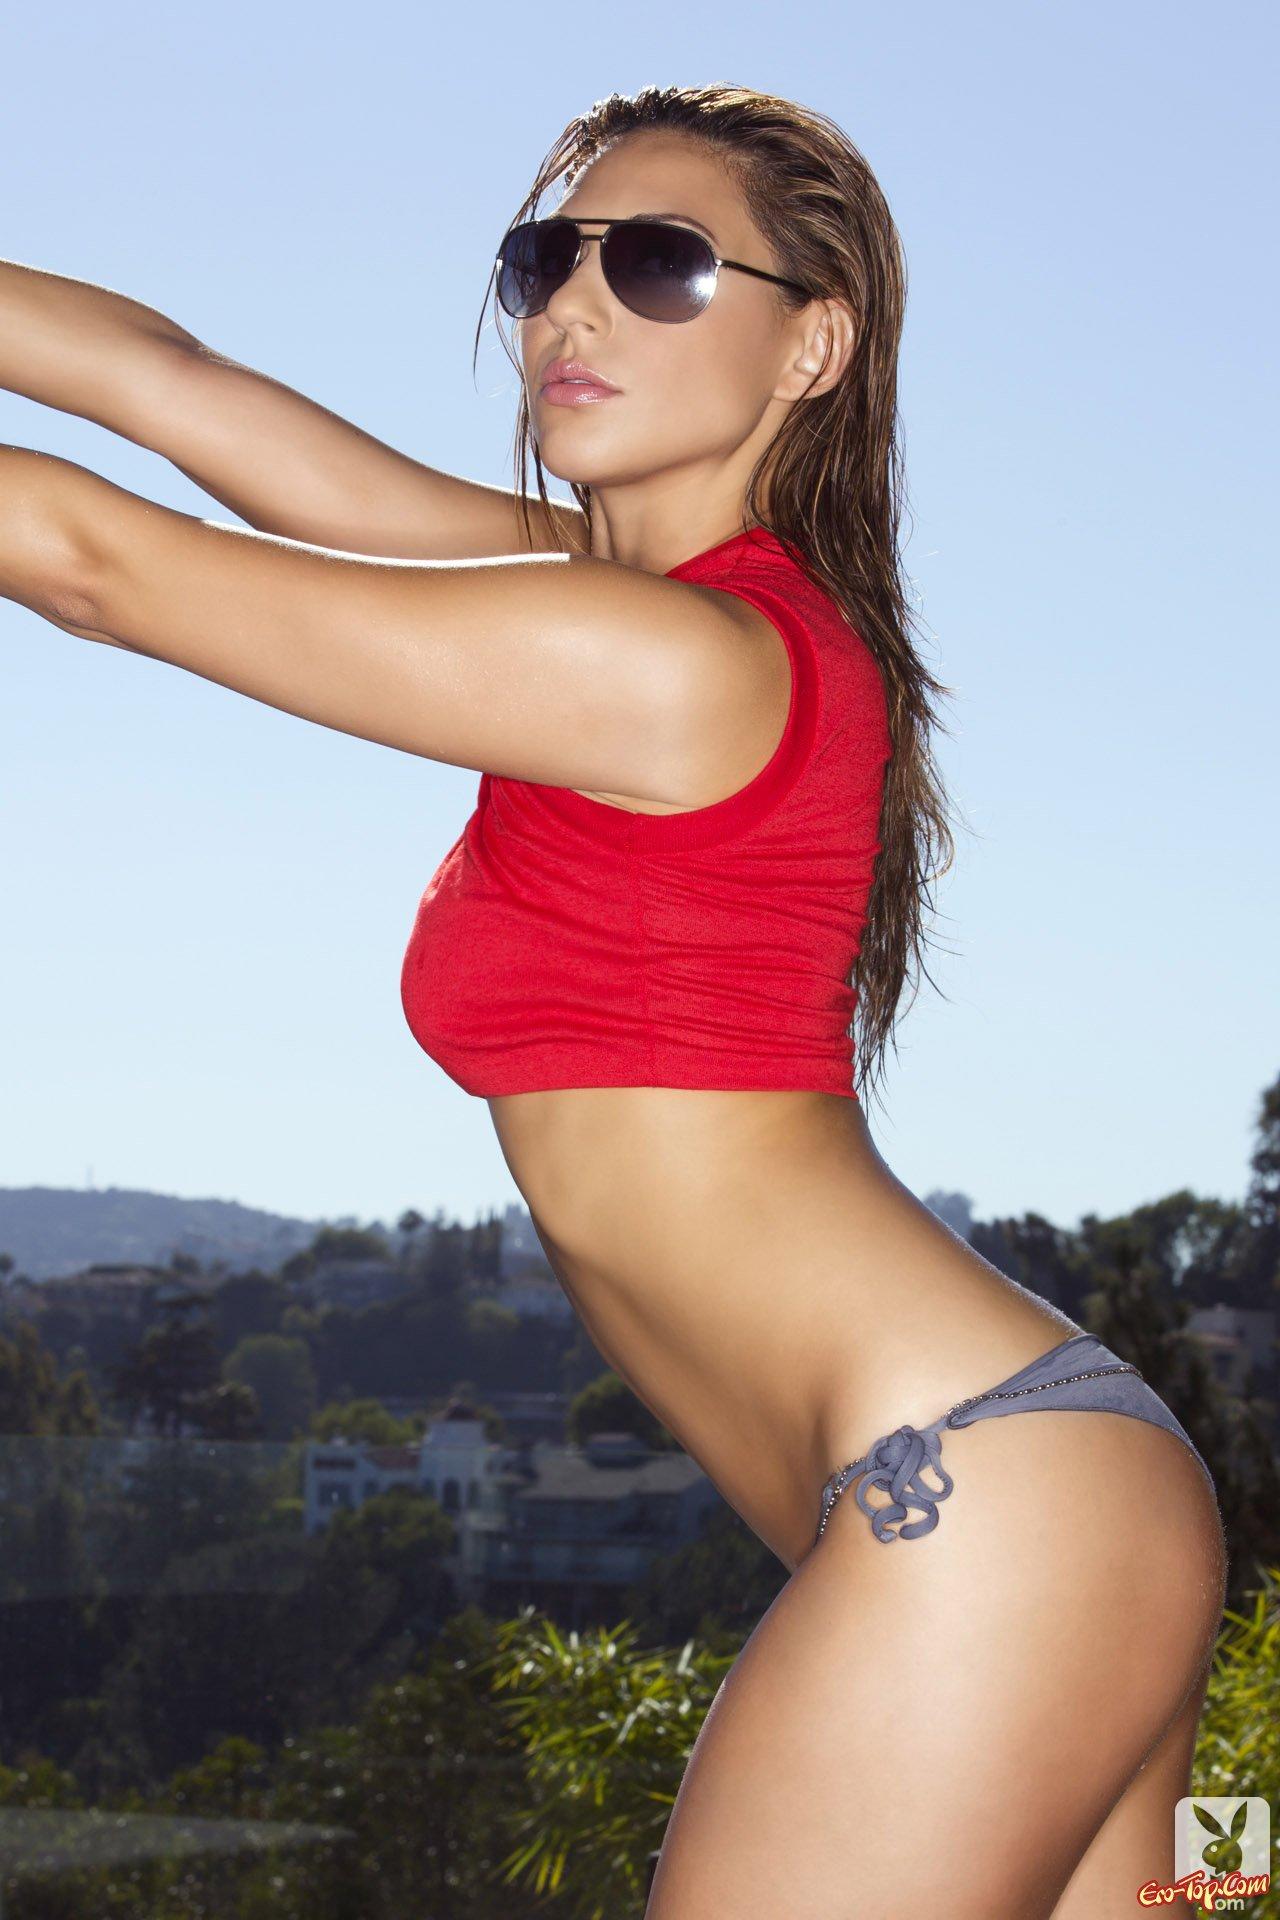 Ariana Loken